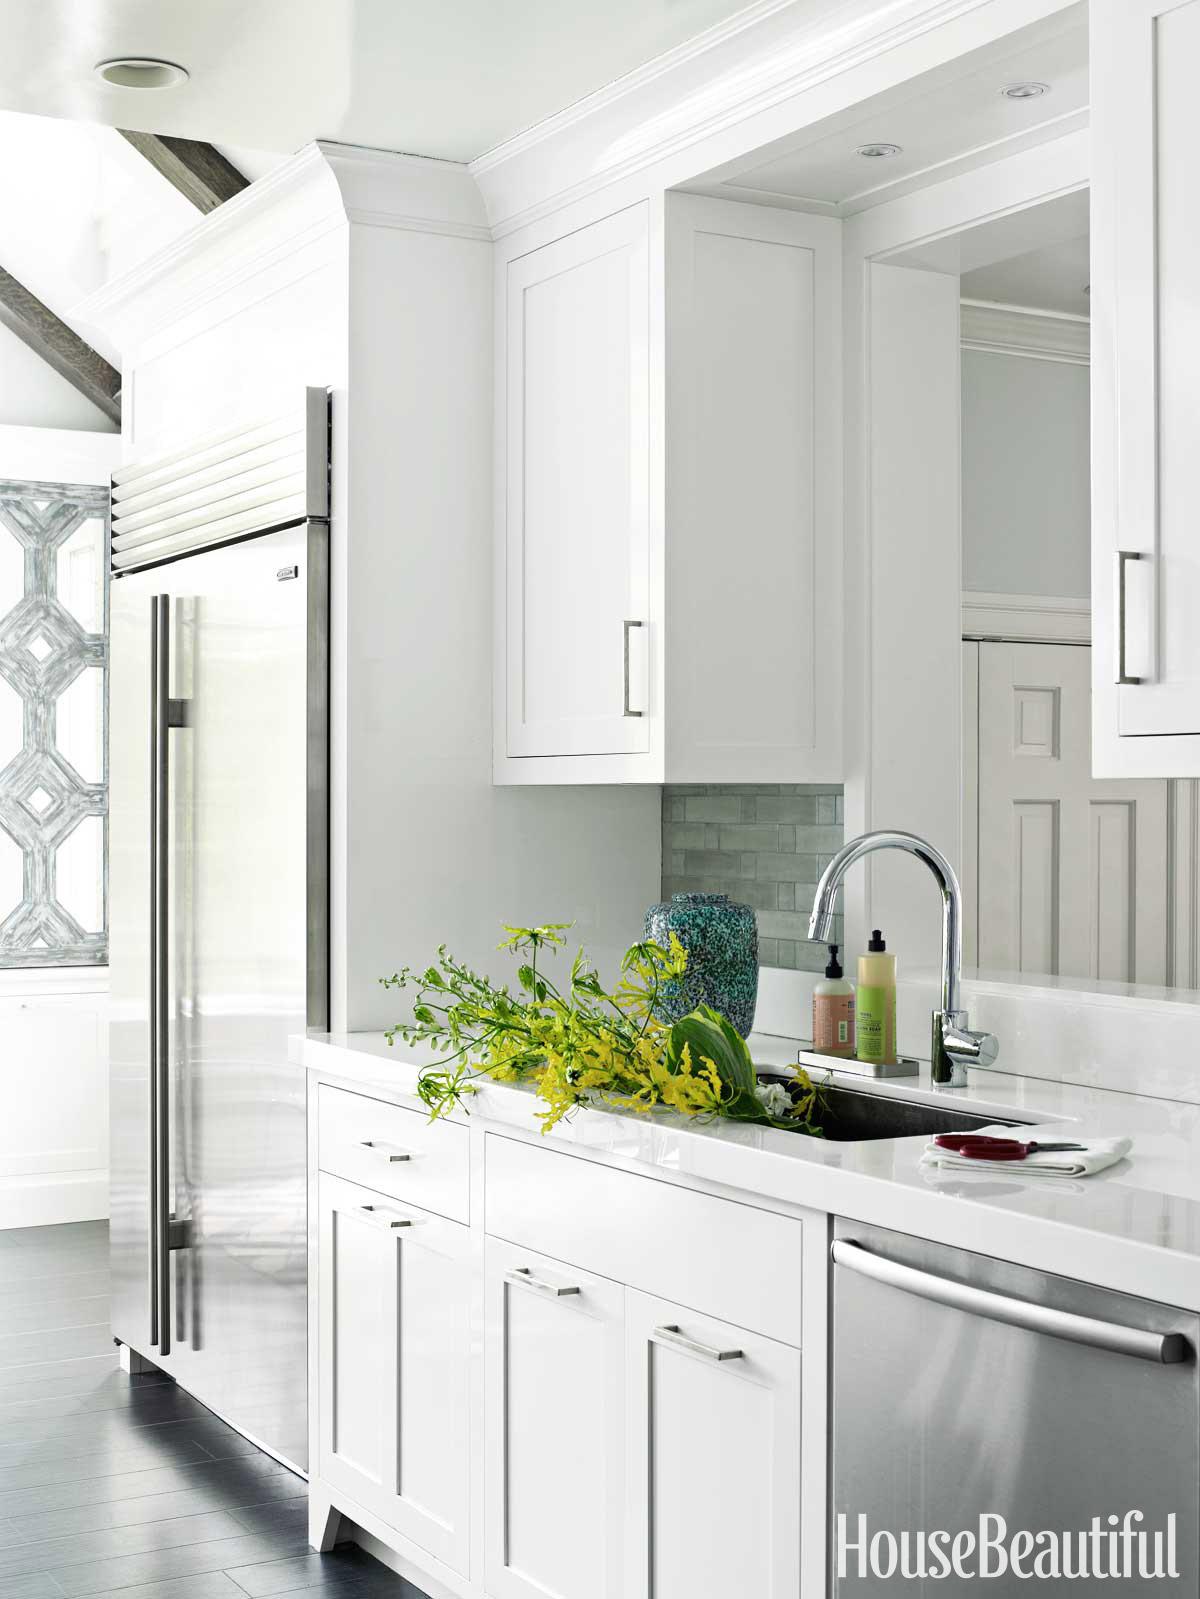 Louise brooks interview white kitchen design for Pass through kitchen ideas